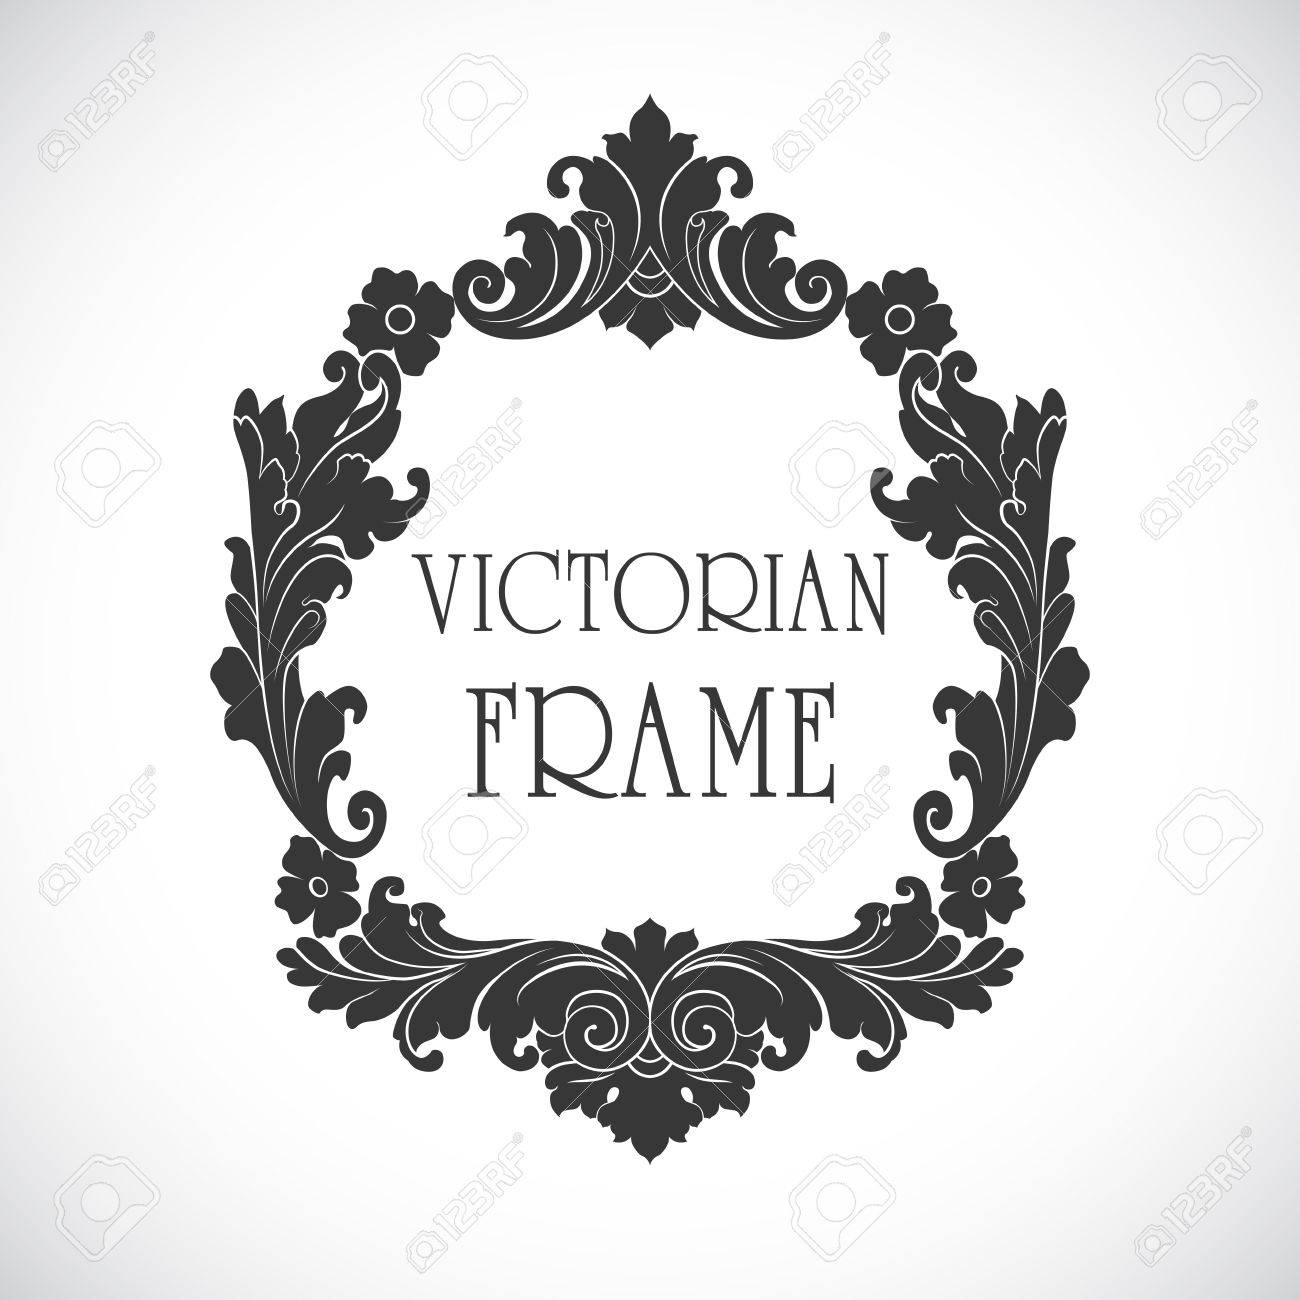 victorian frame vector royalty free cliparts vectors and stock rh 123rf com victorian ornament frame vector free victorian ornament frame vector free